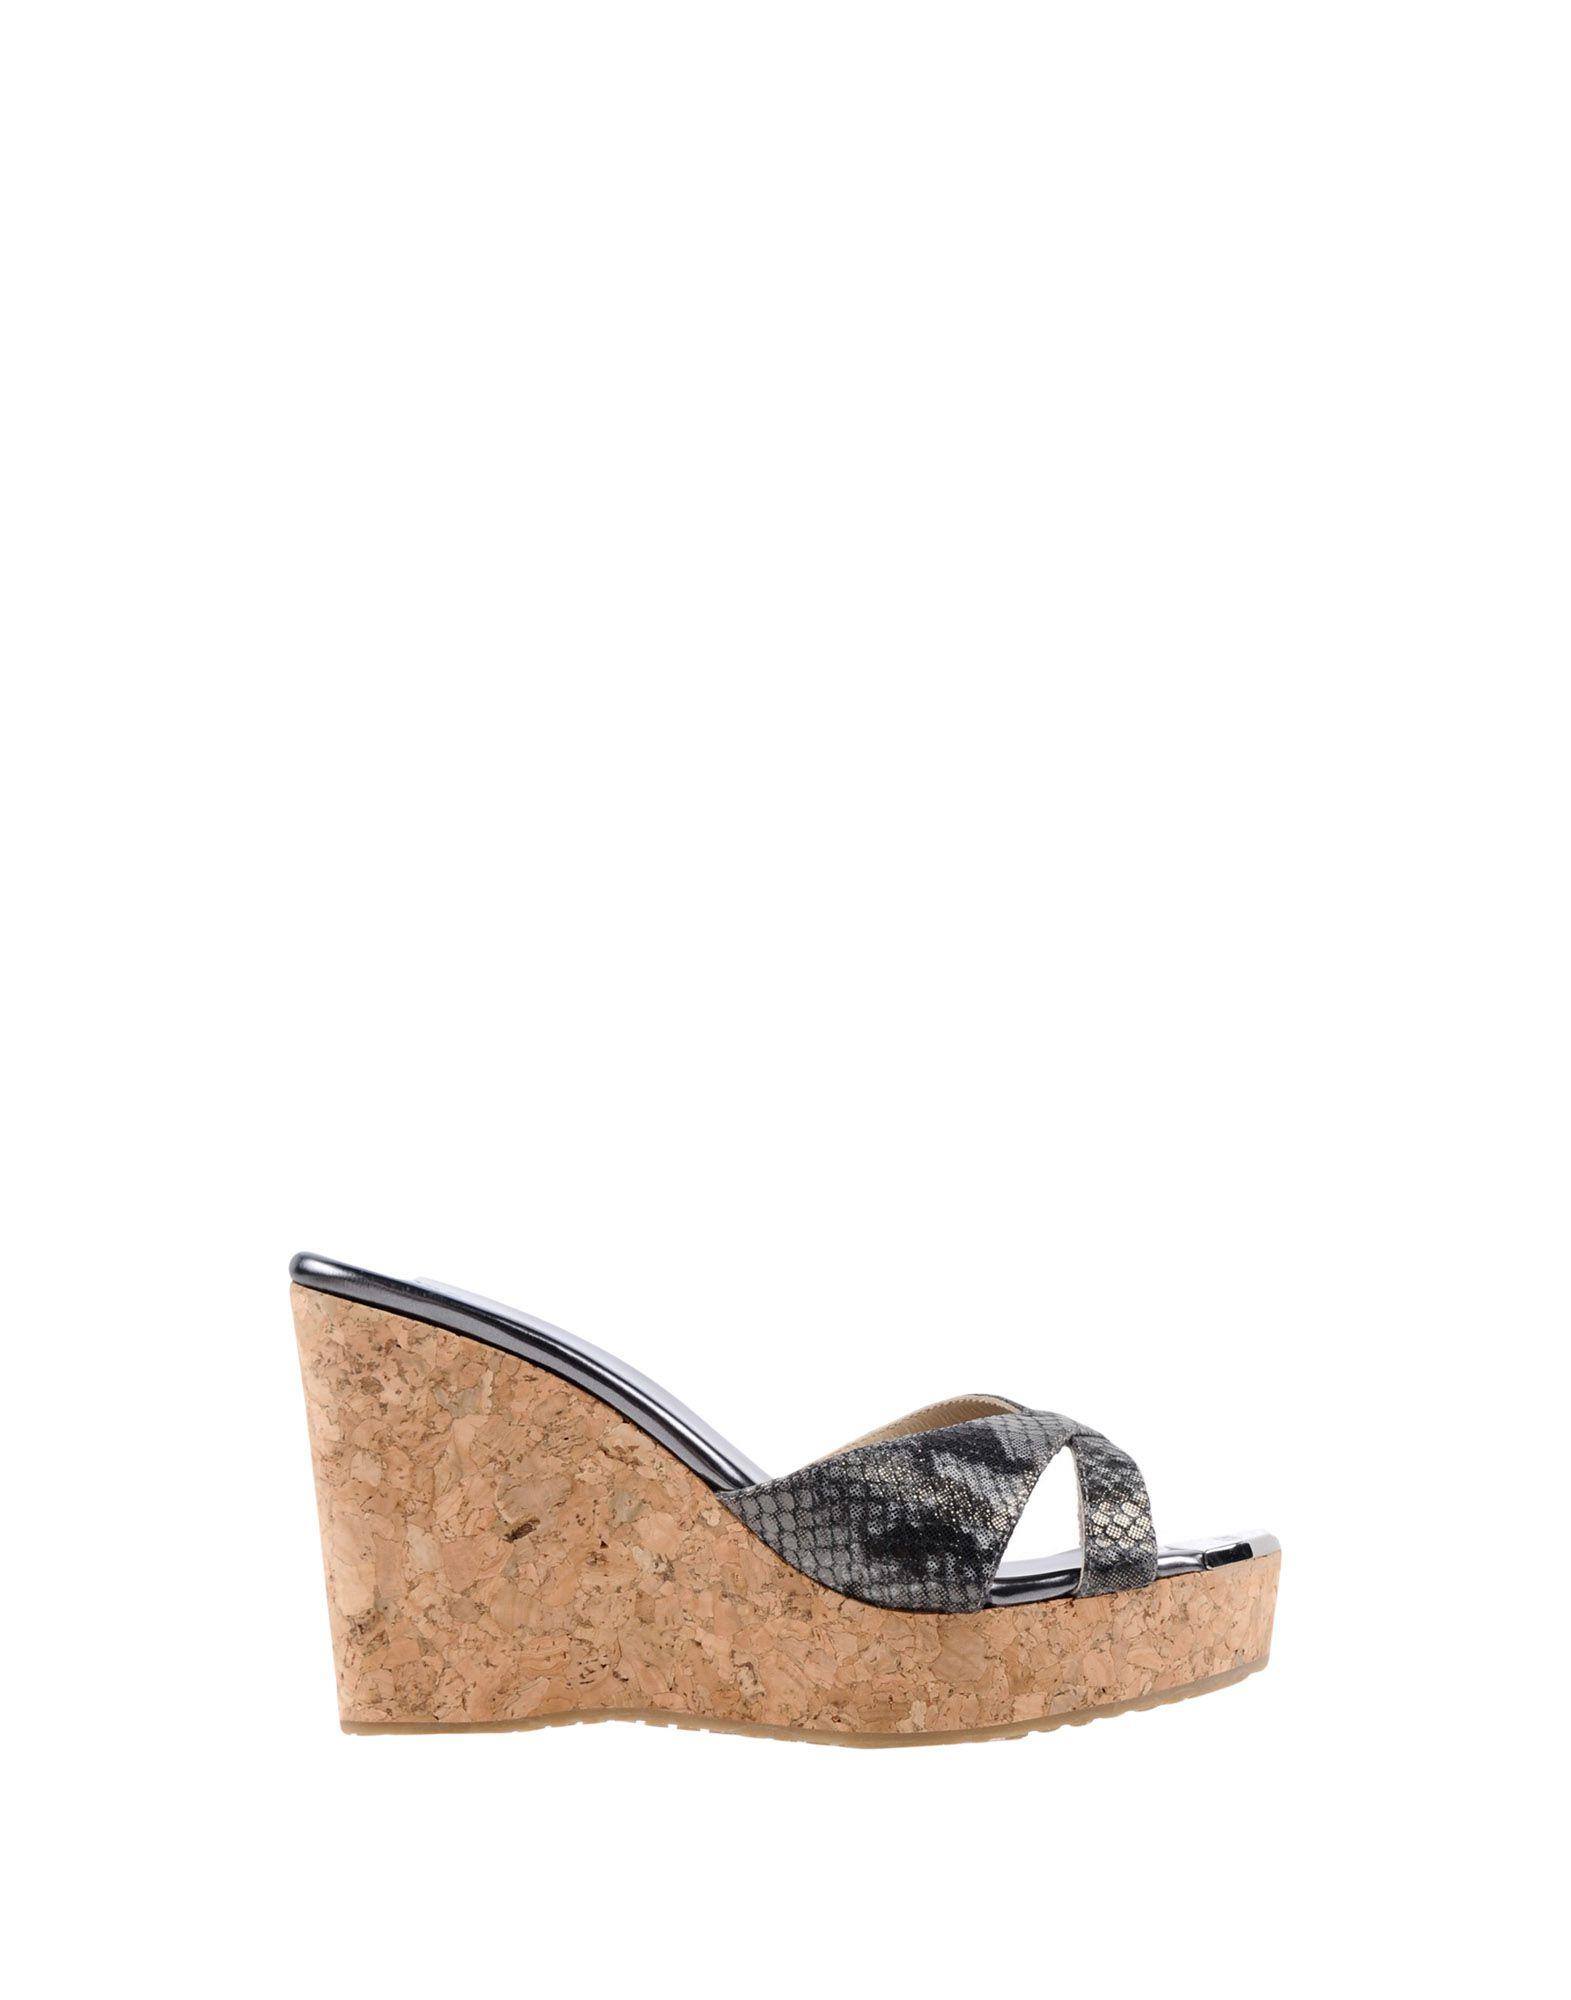 Jimmy Choo Sandalen Damen  Schuhe 11478462VHGünstige gut aussehende Schuhe  67acc3